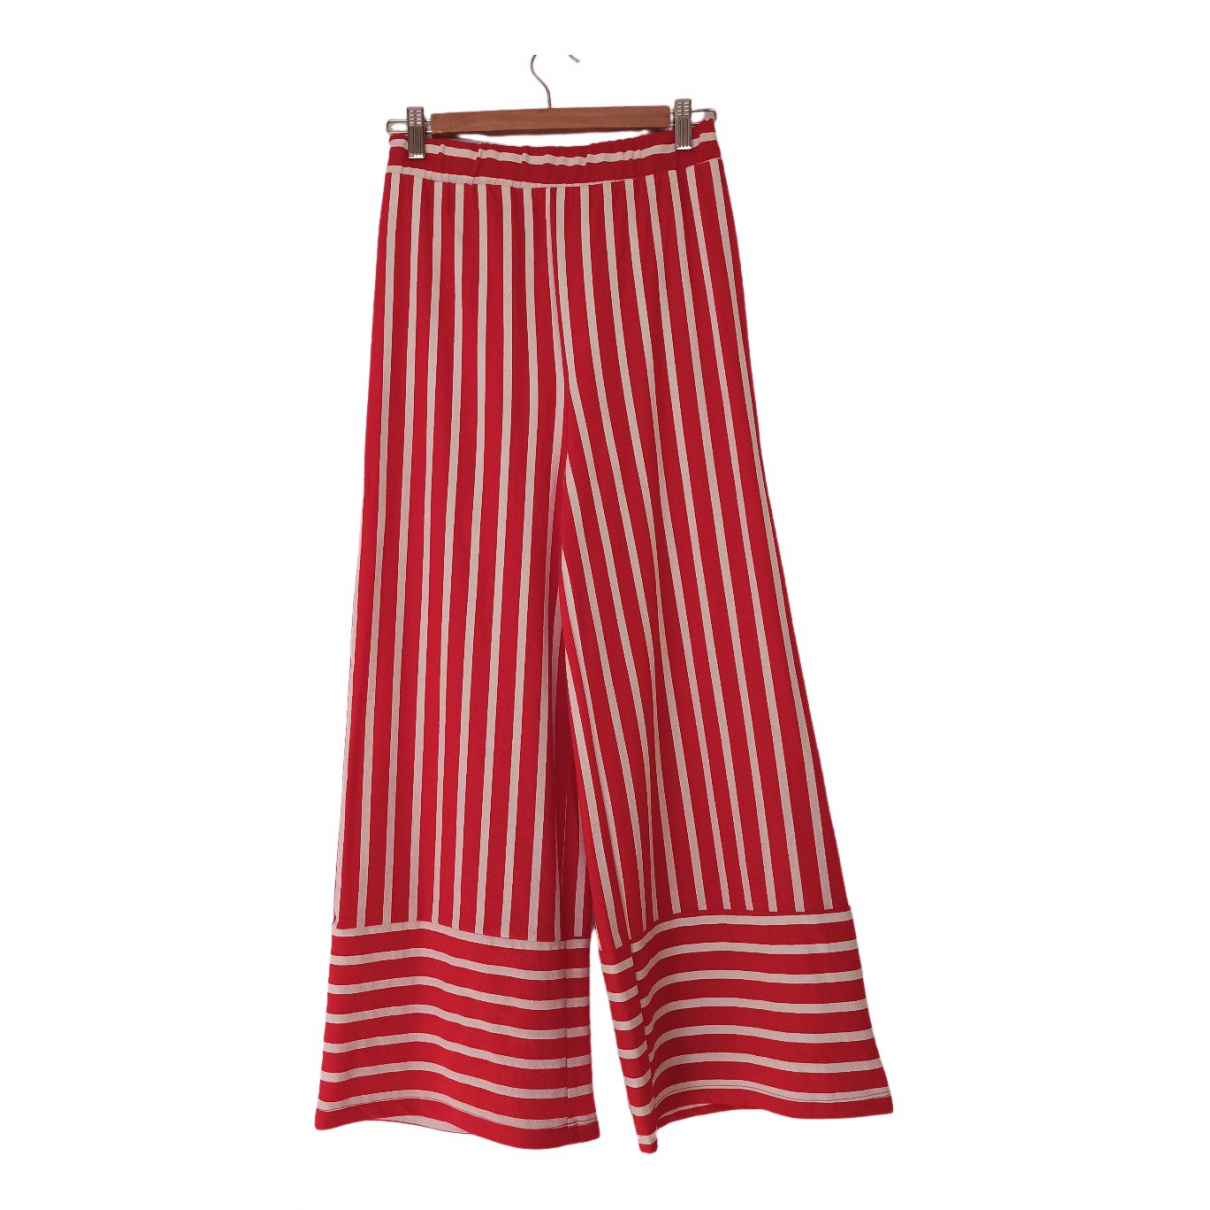 Zara \N Red Trousers for Women S International